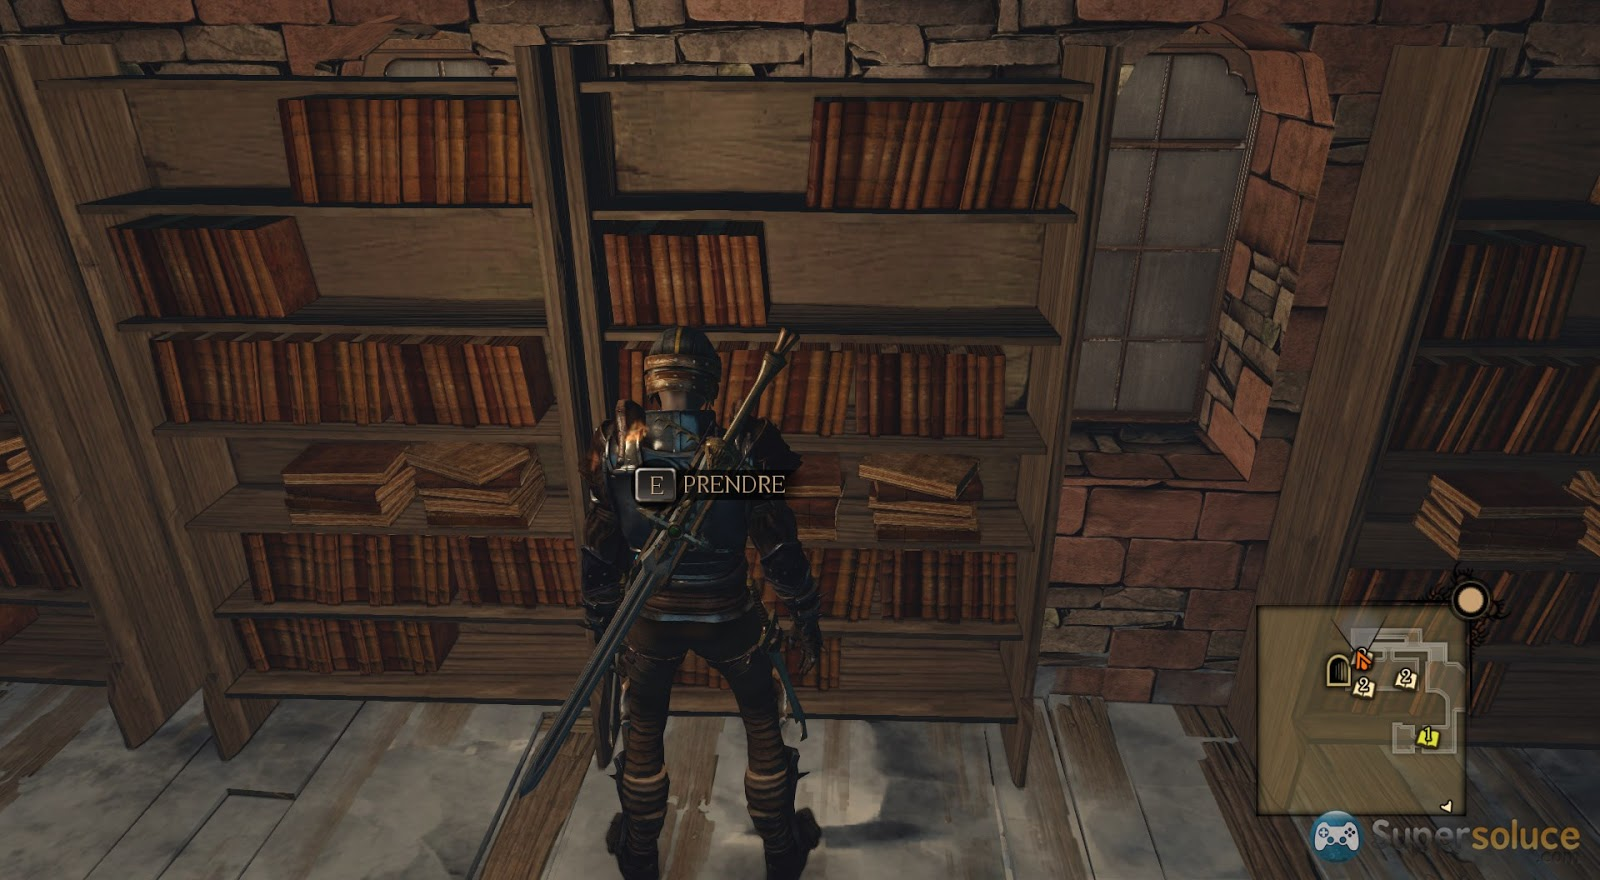 bound-by-flame-quete-annexe-la-bibliotheque-gelee-002.jpg